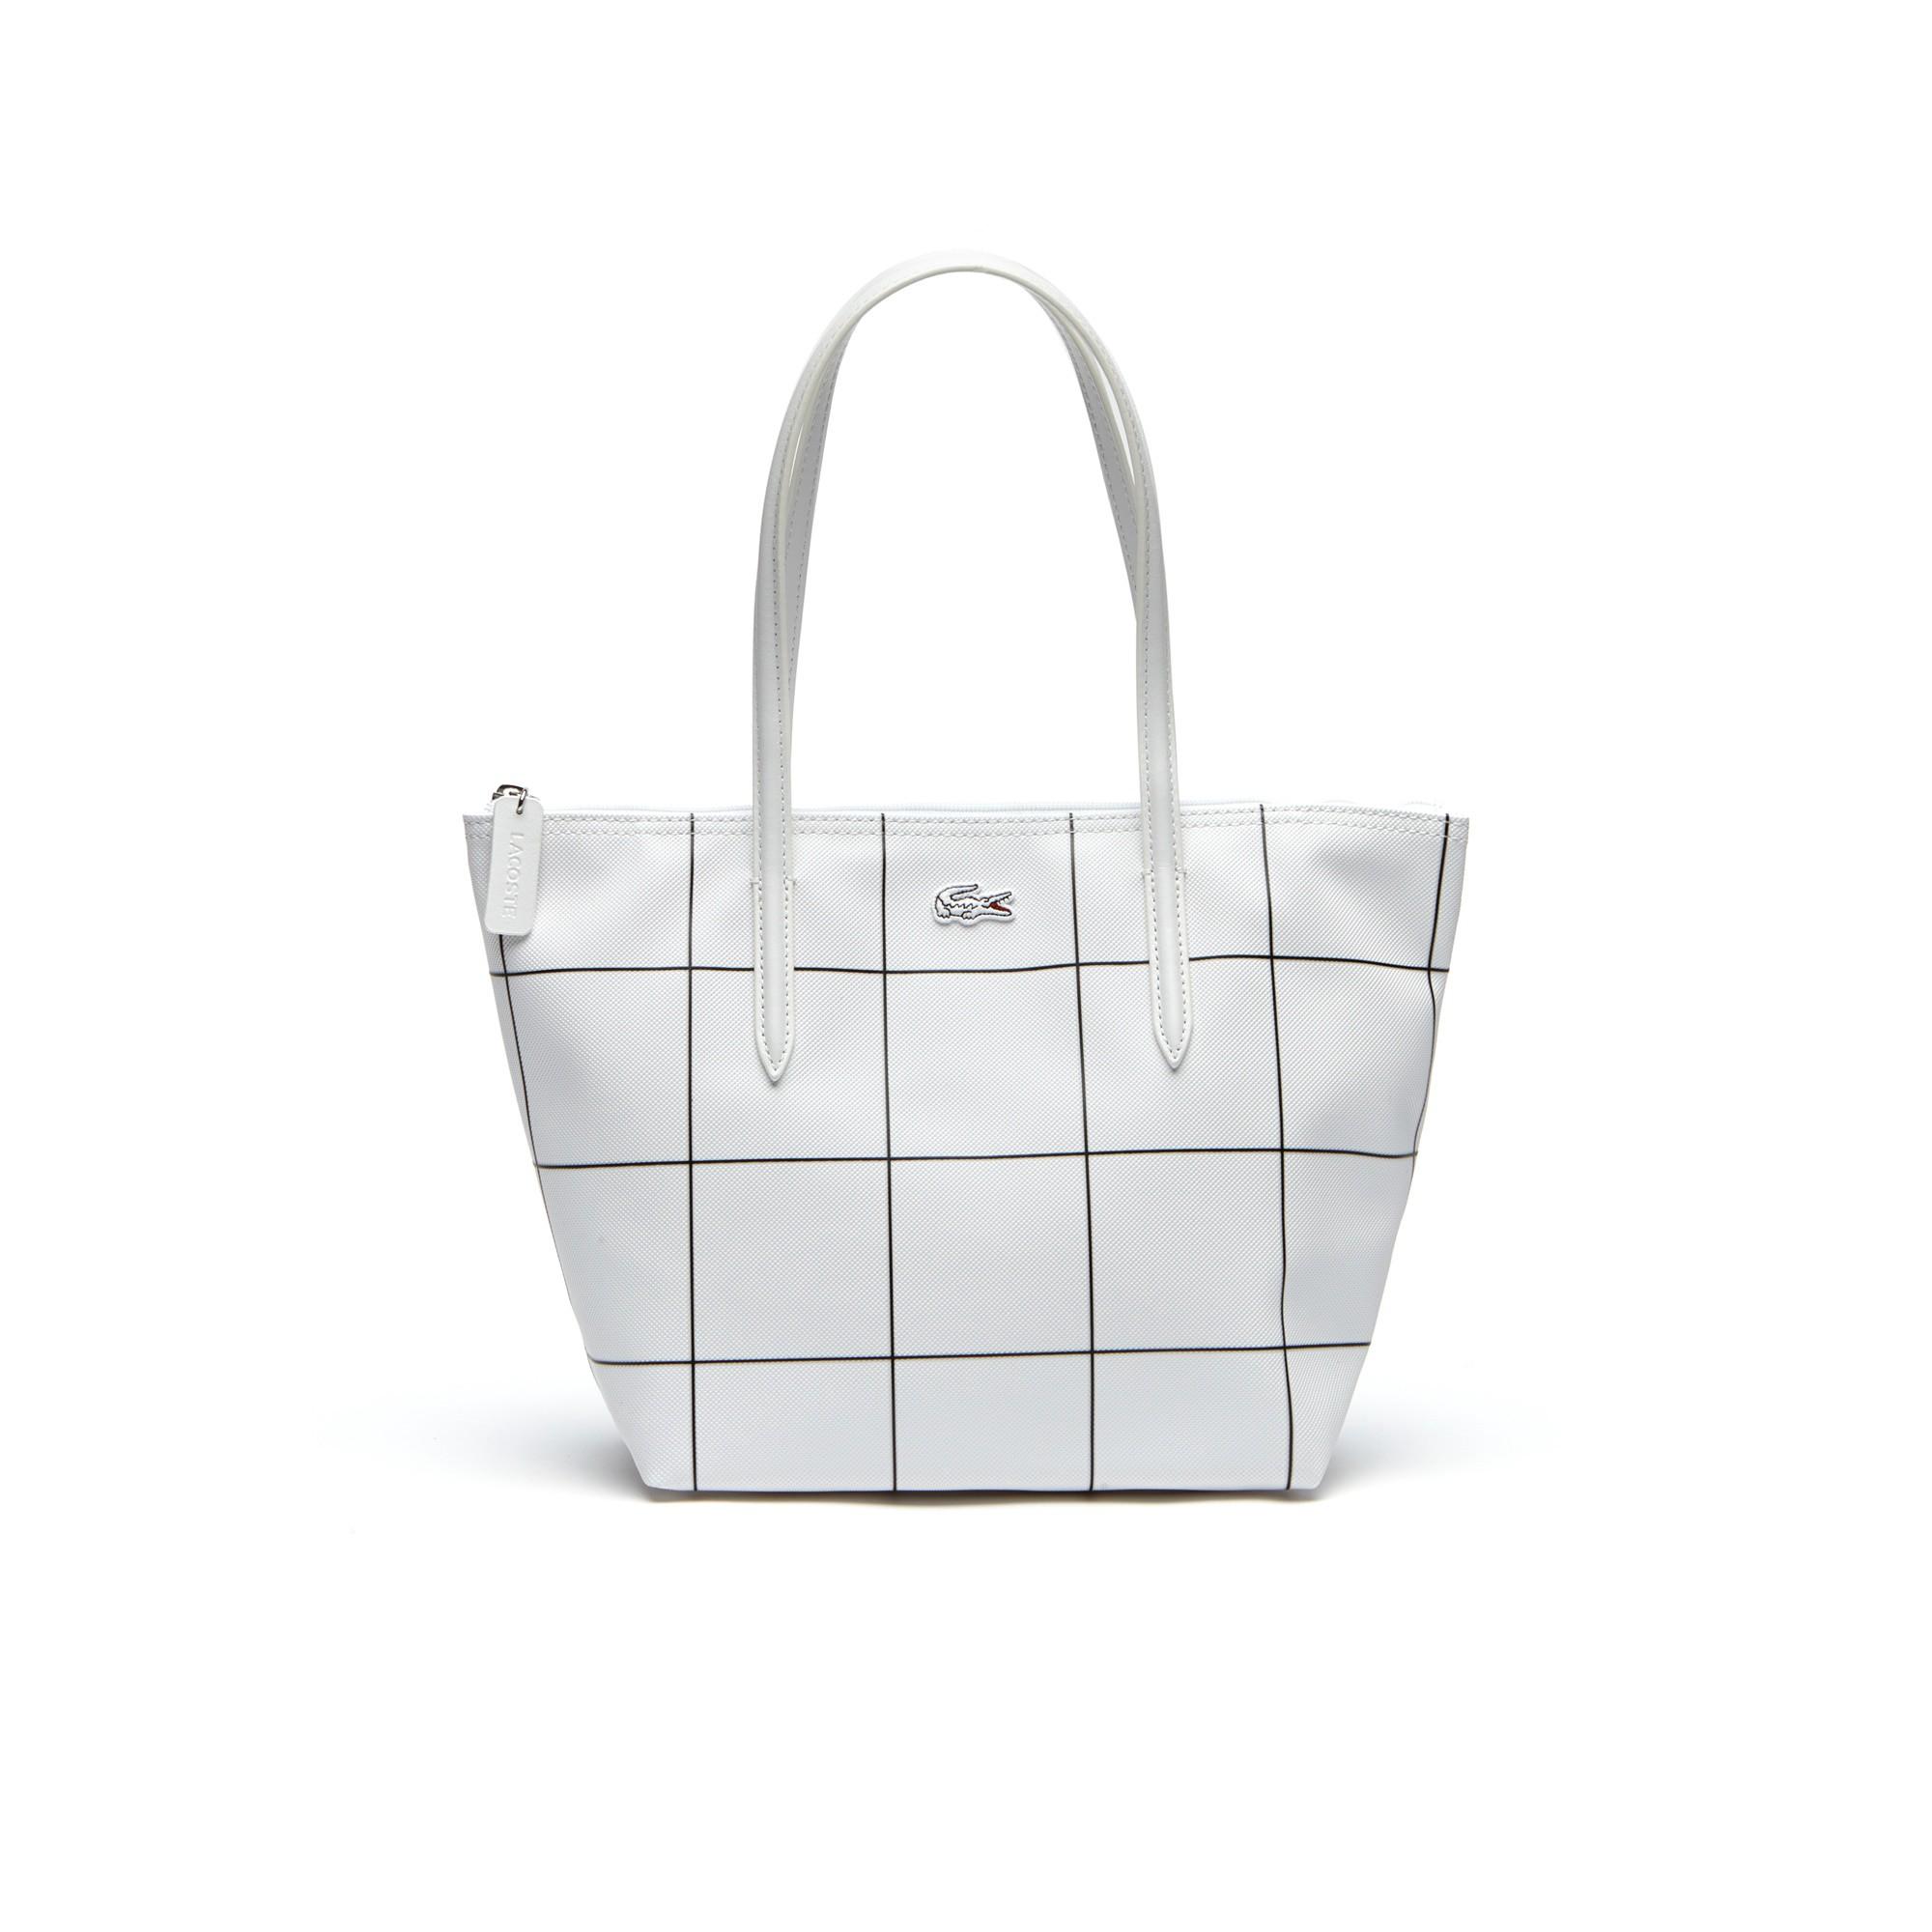 bdfadb0d42 Women's L.12.12 Concept White Squares Small Zip Tote Bag - 943943